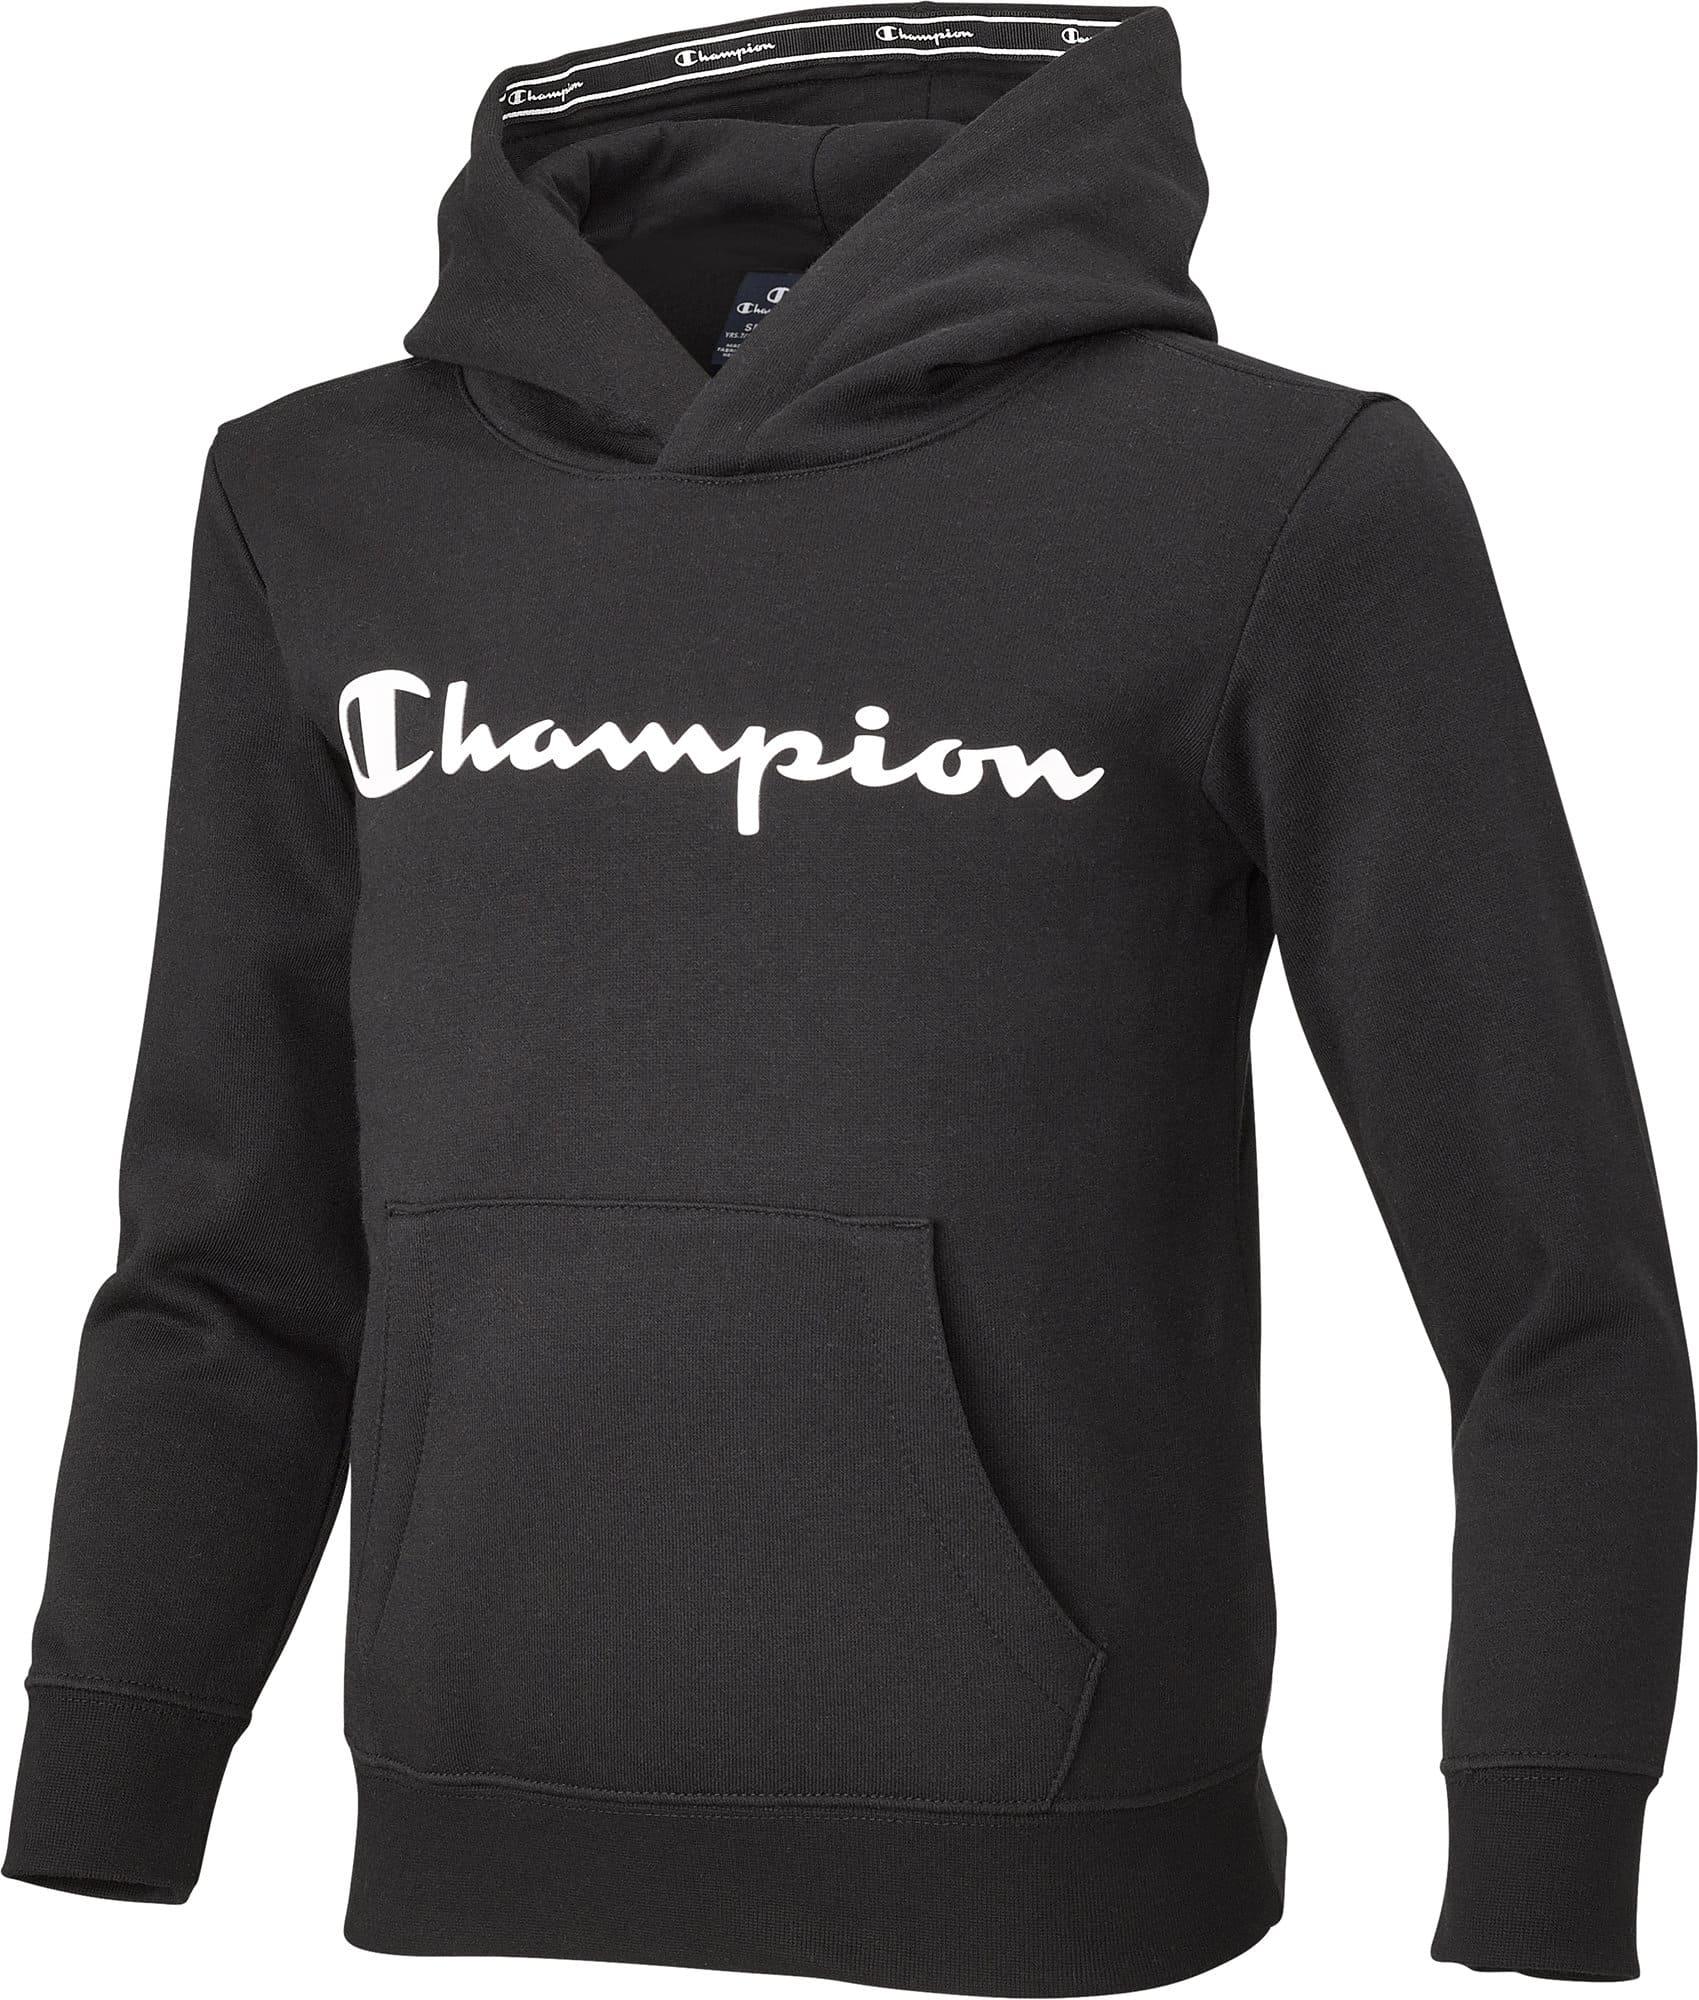 Champion Hooded Sweatshirt Sweat shirt à capuche pour garçon